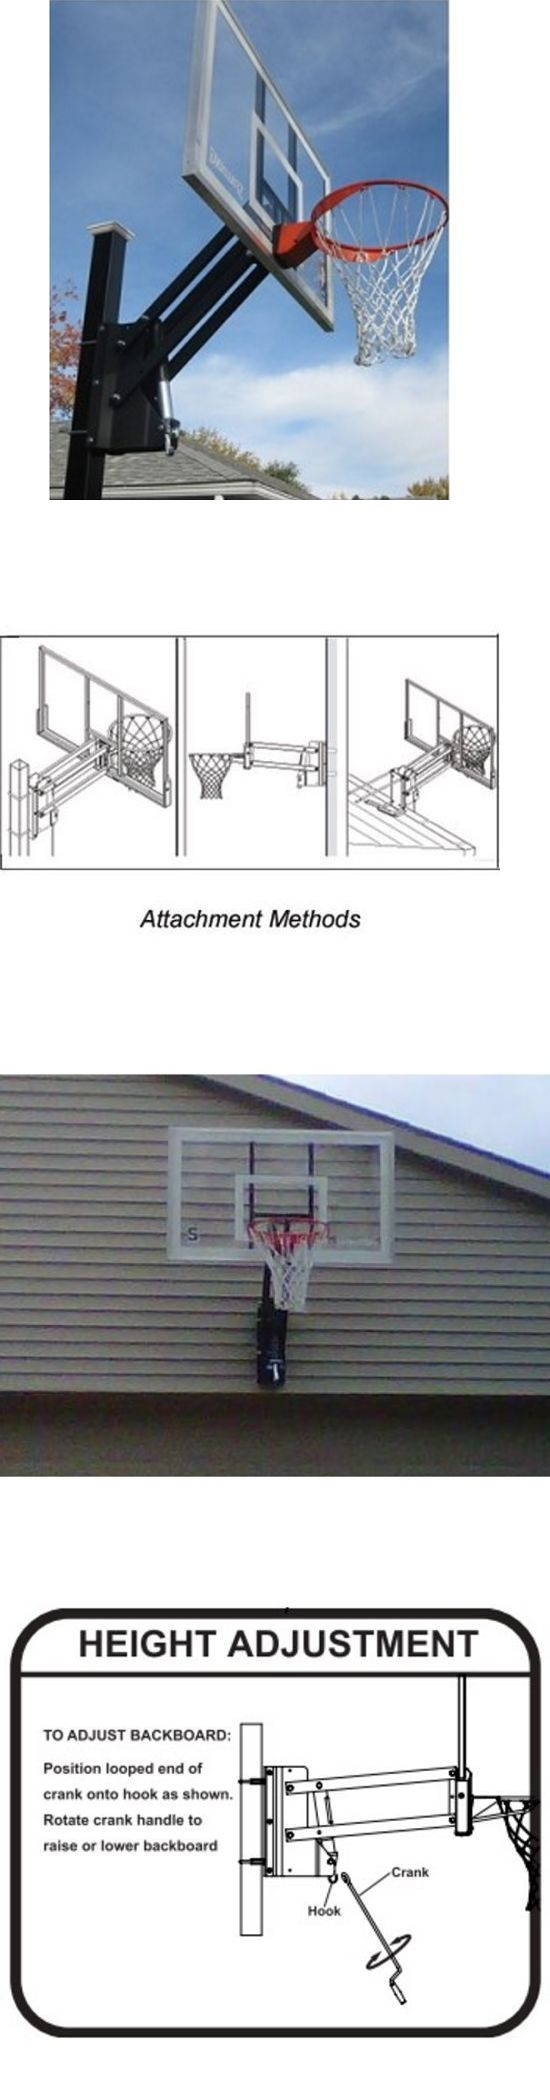 Backboard Systems 21196: Backboard Mounting Kit Basketball Adjustable Bracket Wall Roof Pole Yard Garage -> BUY IT NOW ONLY: $161.35 on eBay!